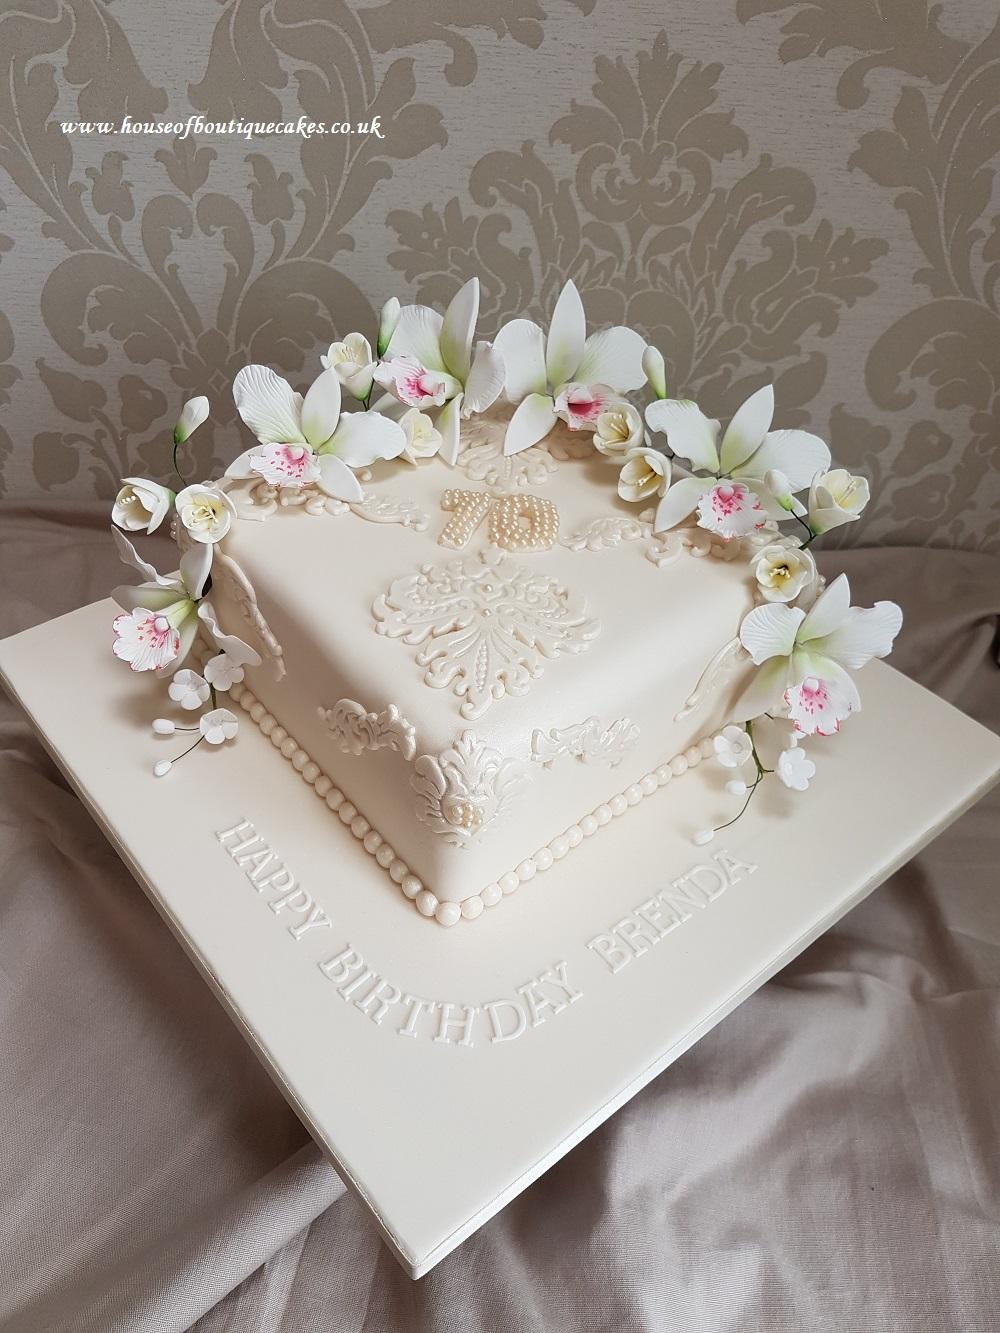 Celebration | house of boutique cakes